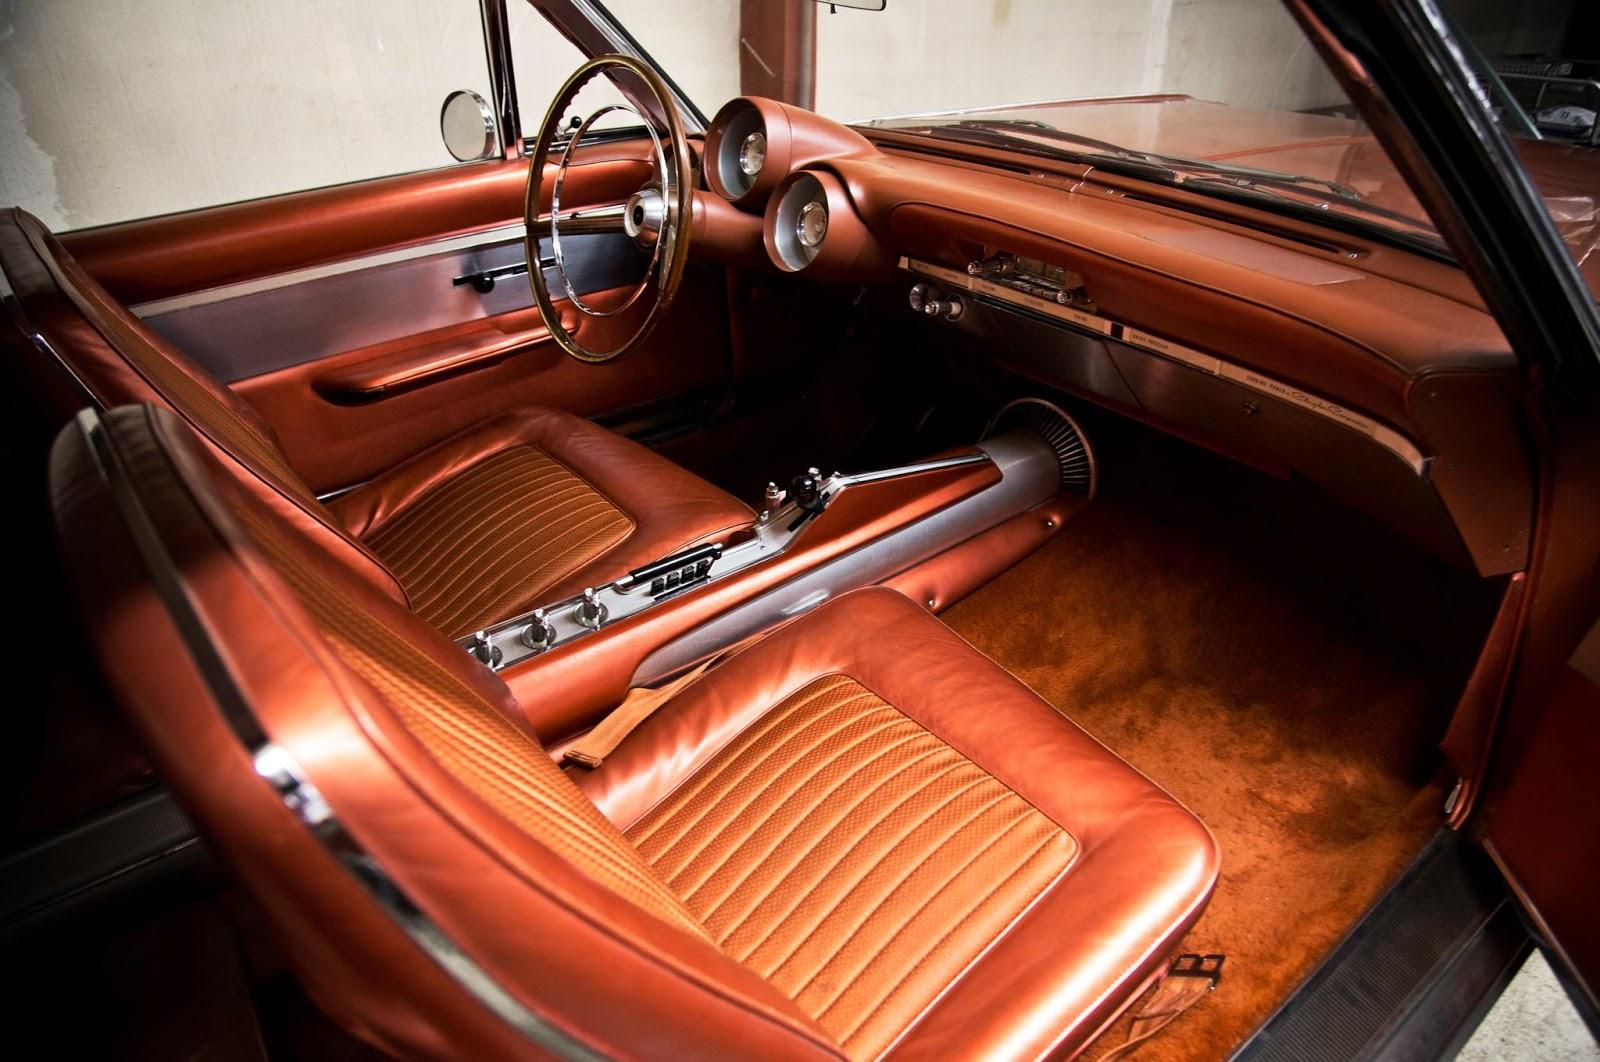 Just A Car Guy The Interior Of The 1964 Chrysler Turbine Car